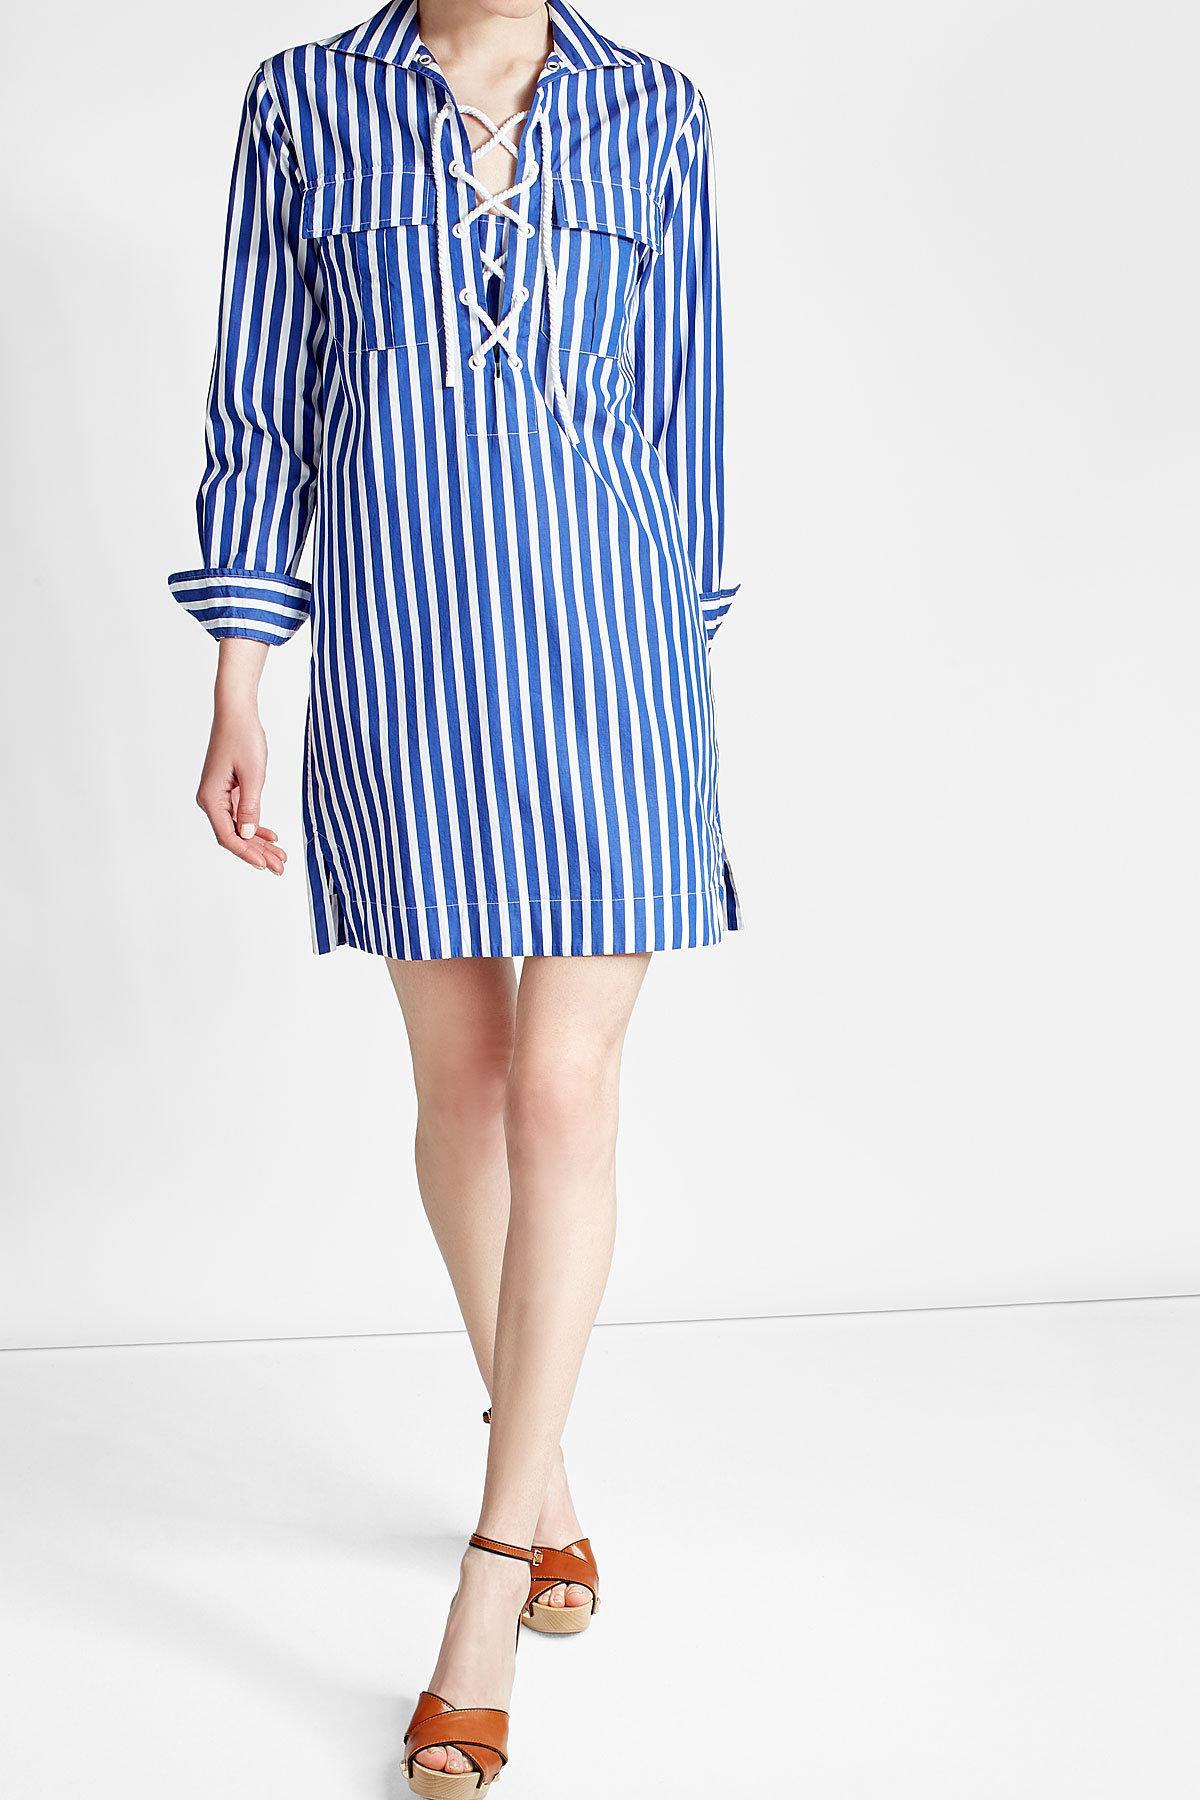 Polo Ralph Lauren Cotton Lace Up Shirt Dress In Blue Lyst